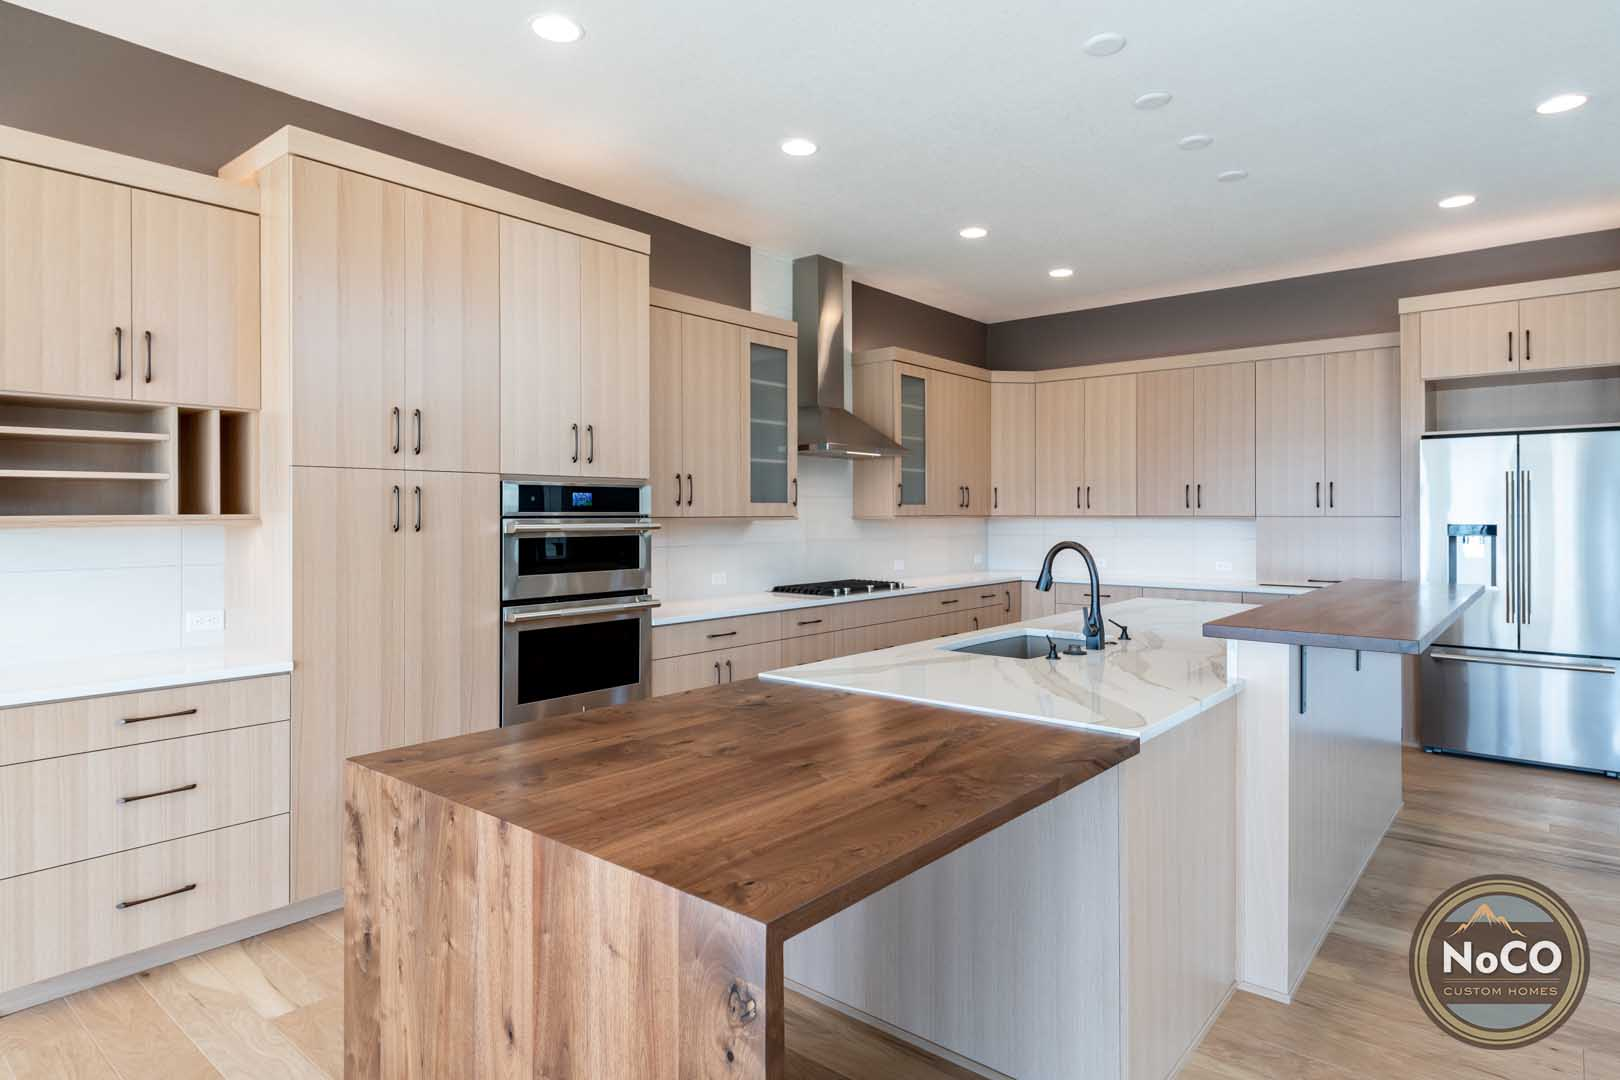 colorado custom home kitchen waterfall countertop